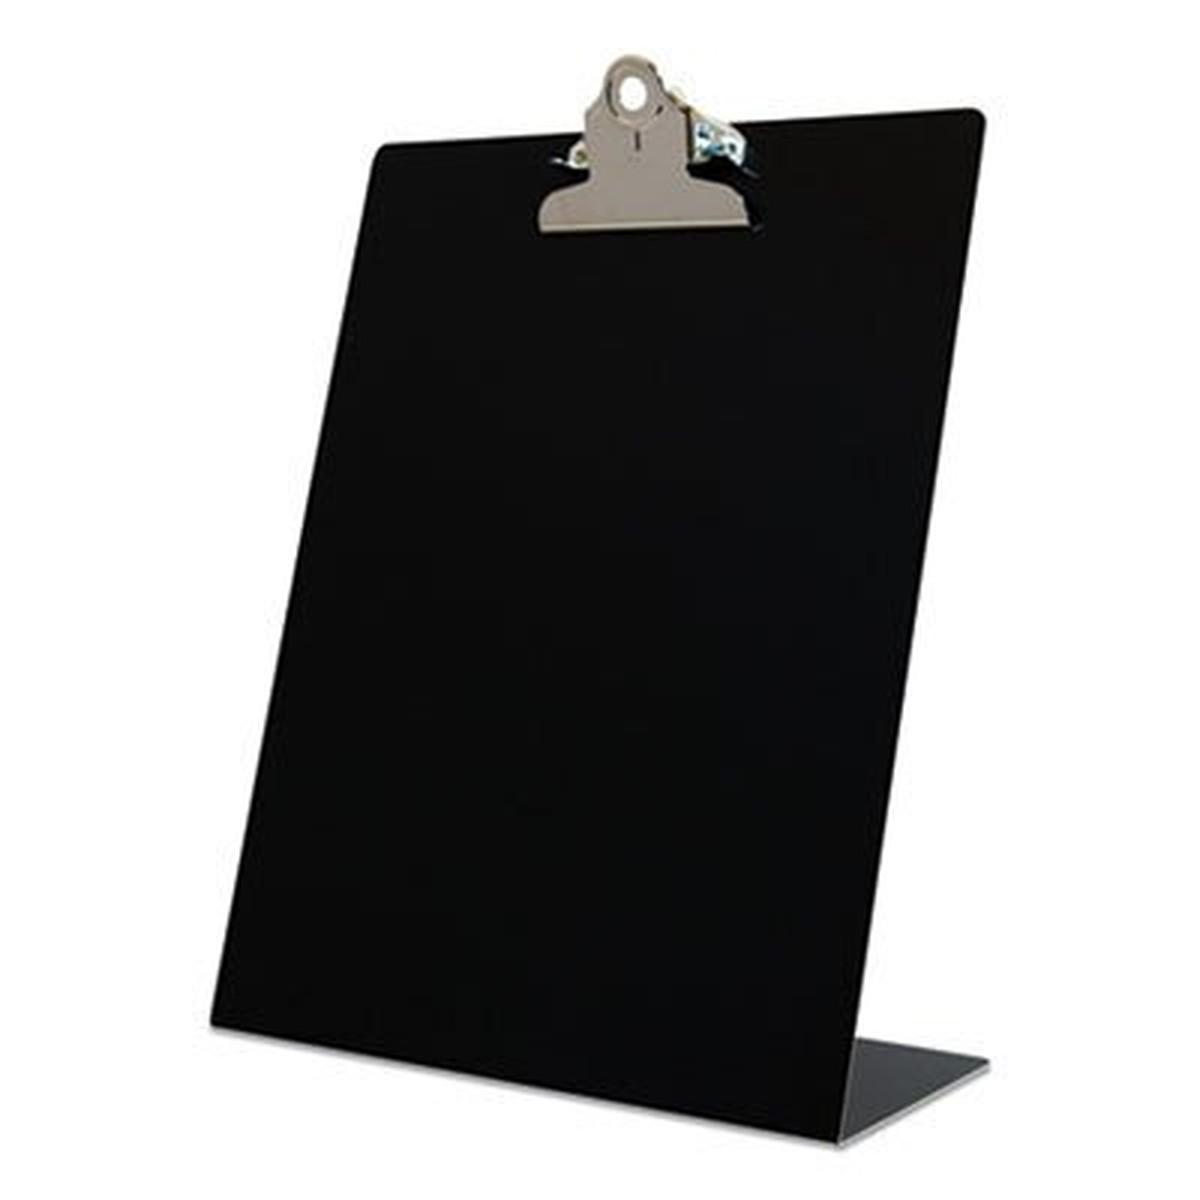 "Free Standing Clipboard, Portrait, 1"" Clip Capacity, 8.5 x 11 Sheets, Black"